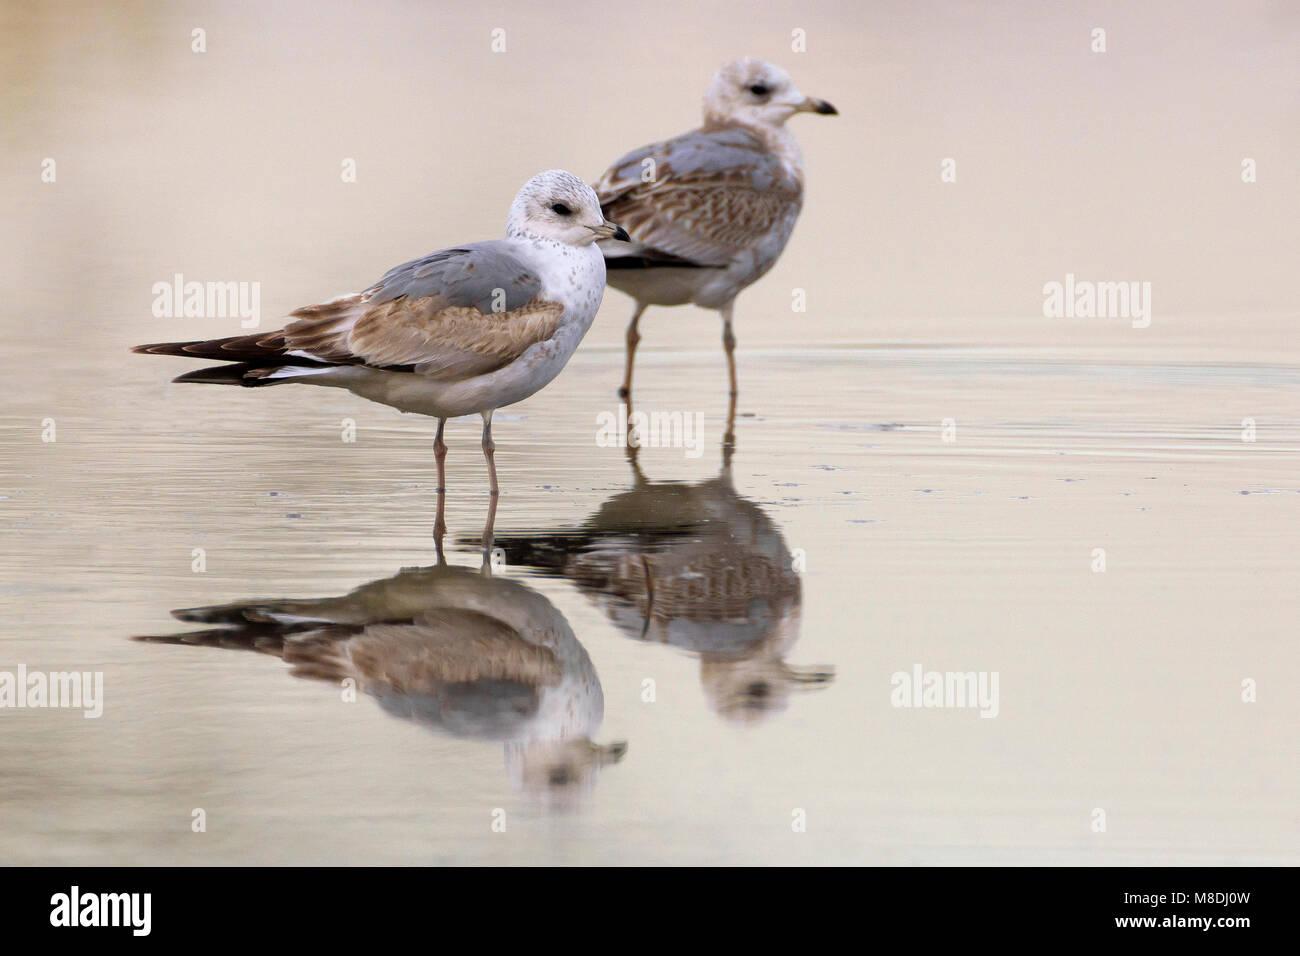 Onvolwassen Stormmeeuw; Immature Mew Gull - Stock Image